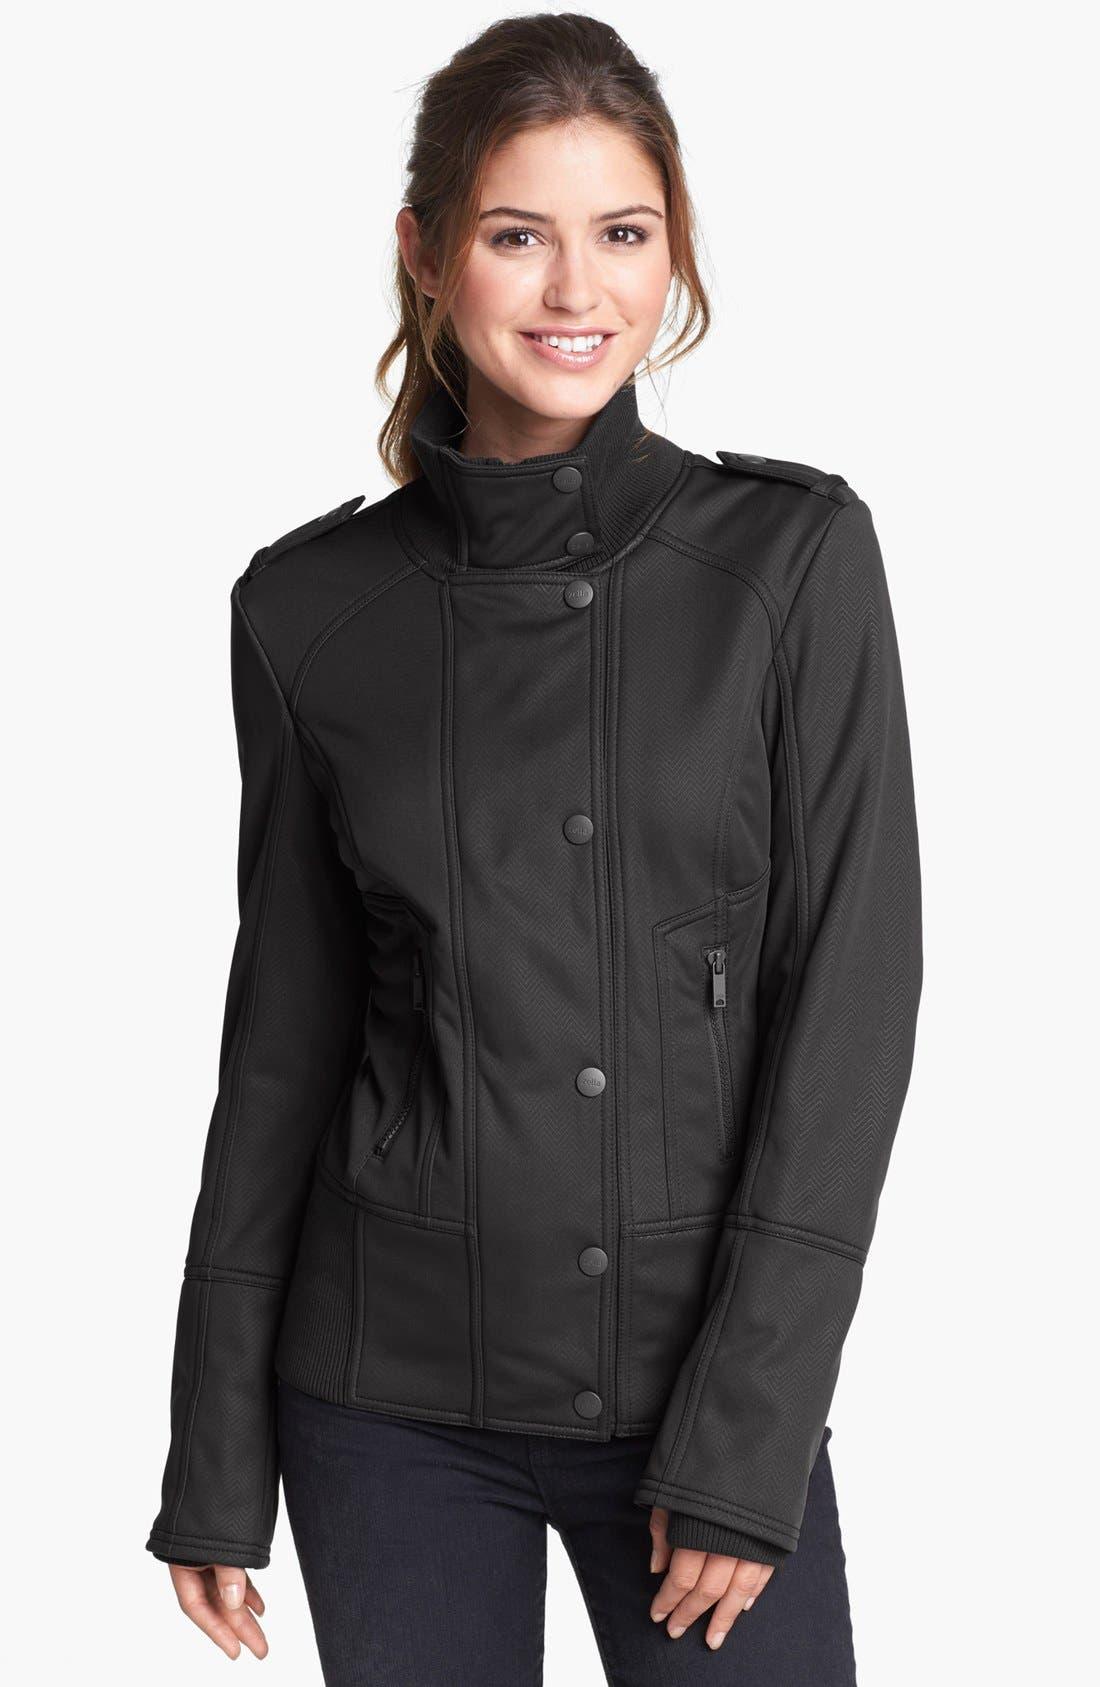 Main Image - Zella 'Bella' Soft Shell Jacket